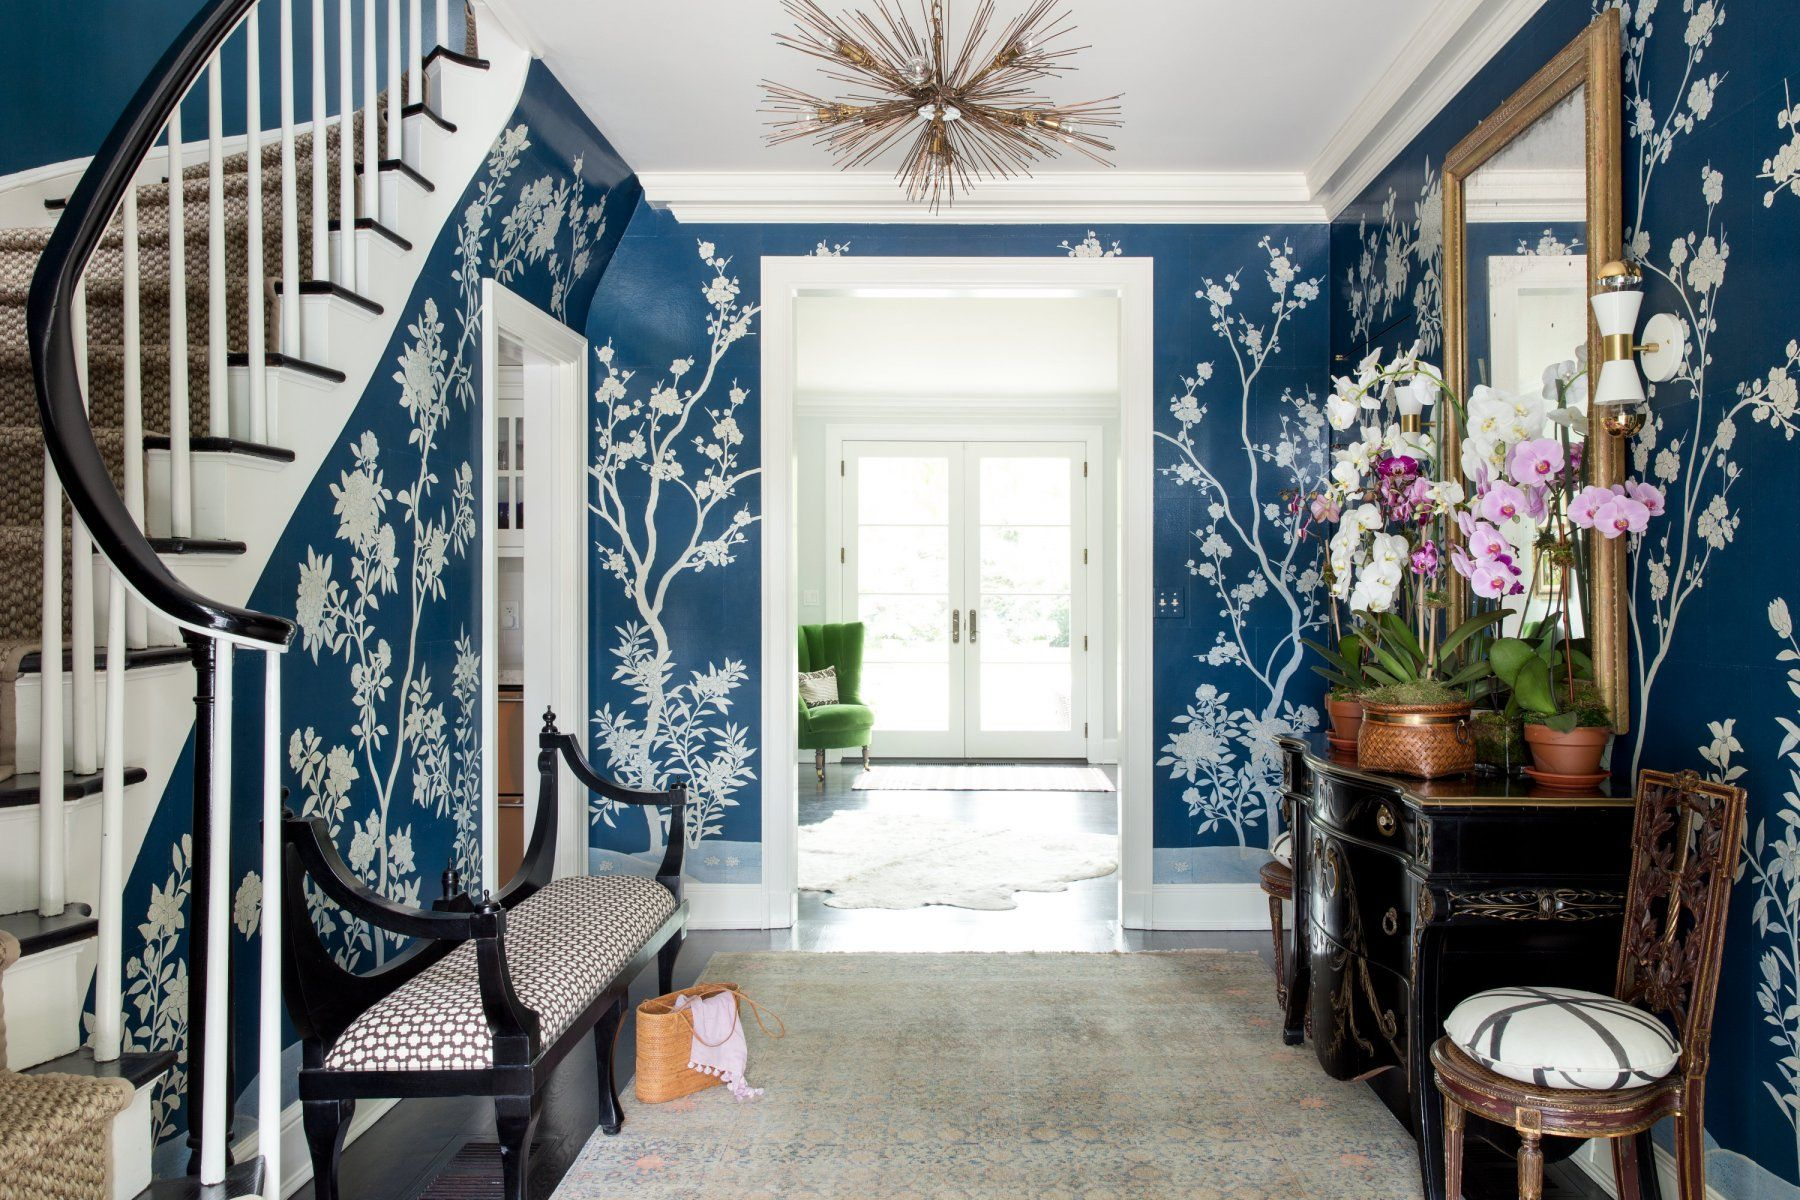 Gracie Studio Wallpaper Eclectic Decor House Painting Cost Decor Definition